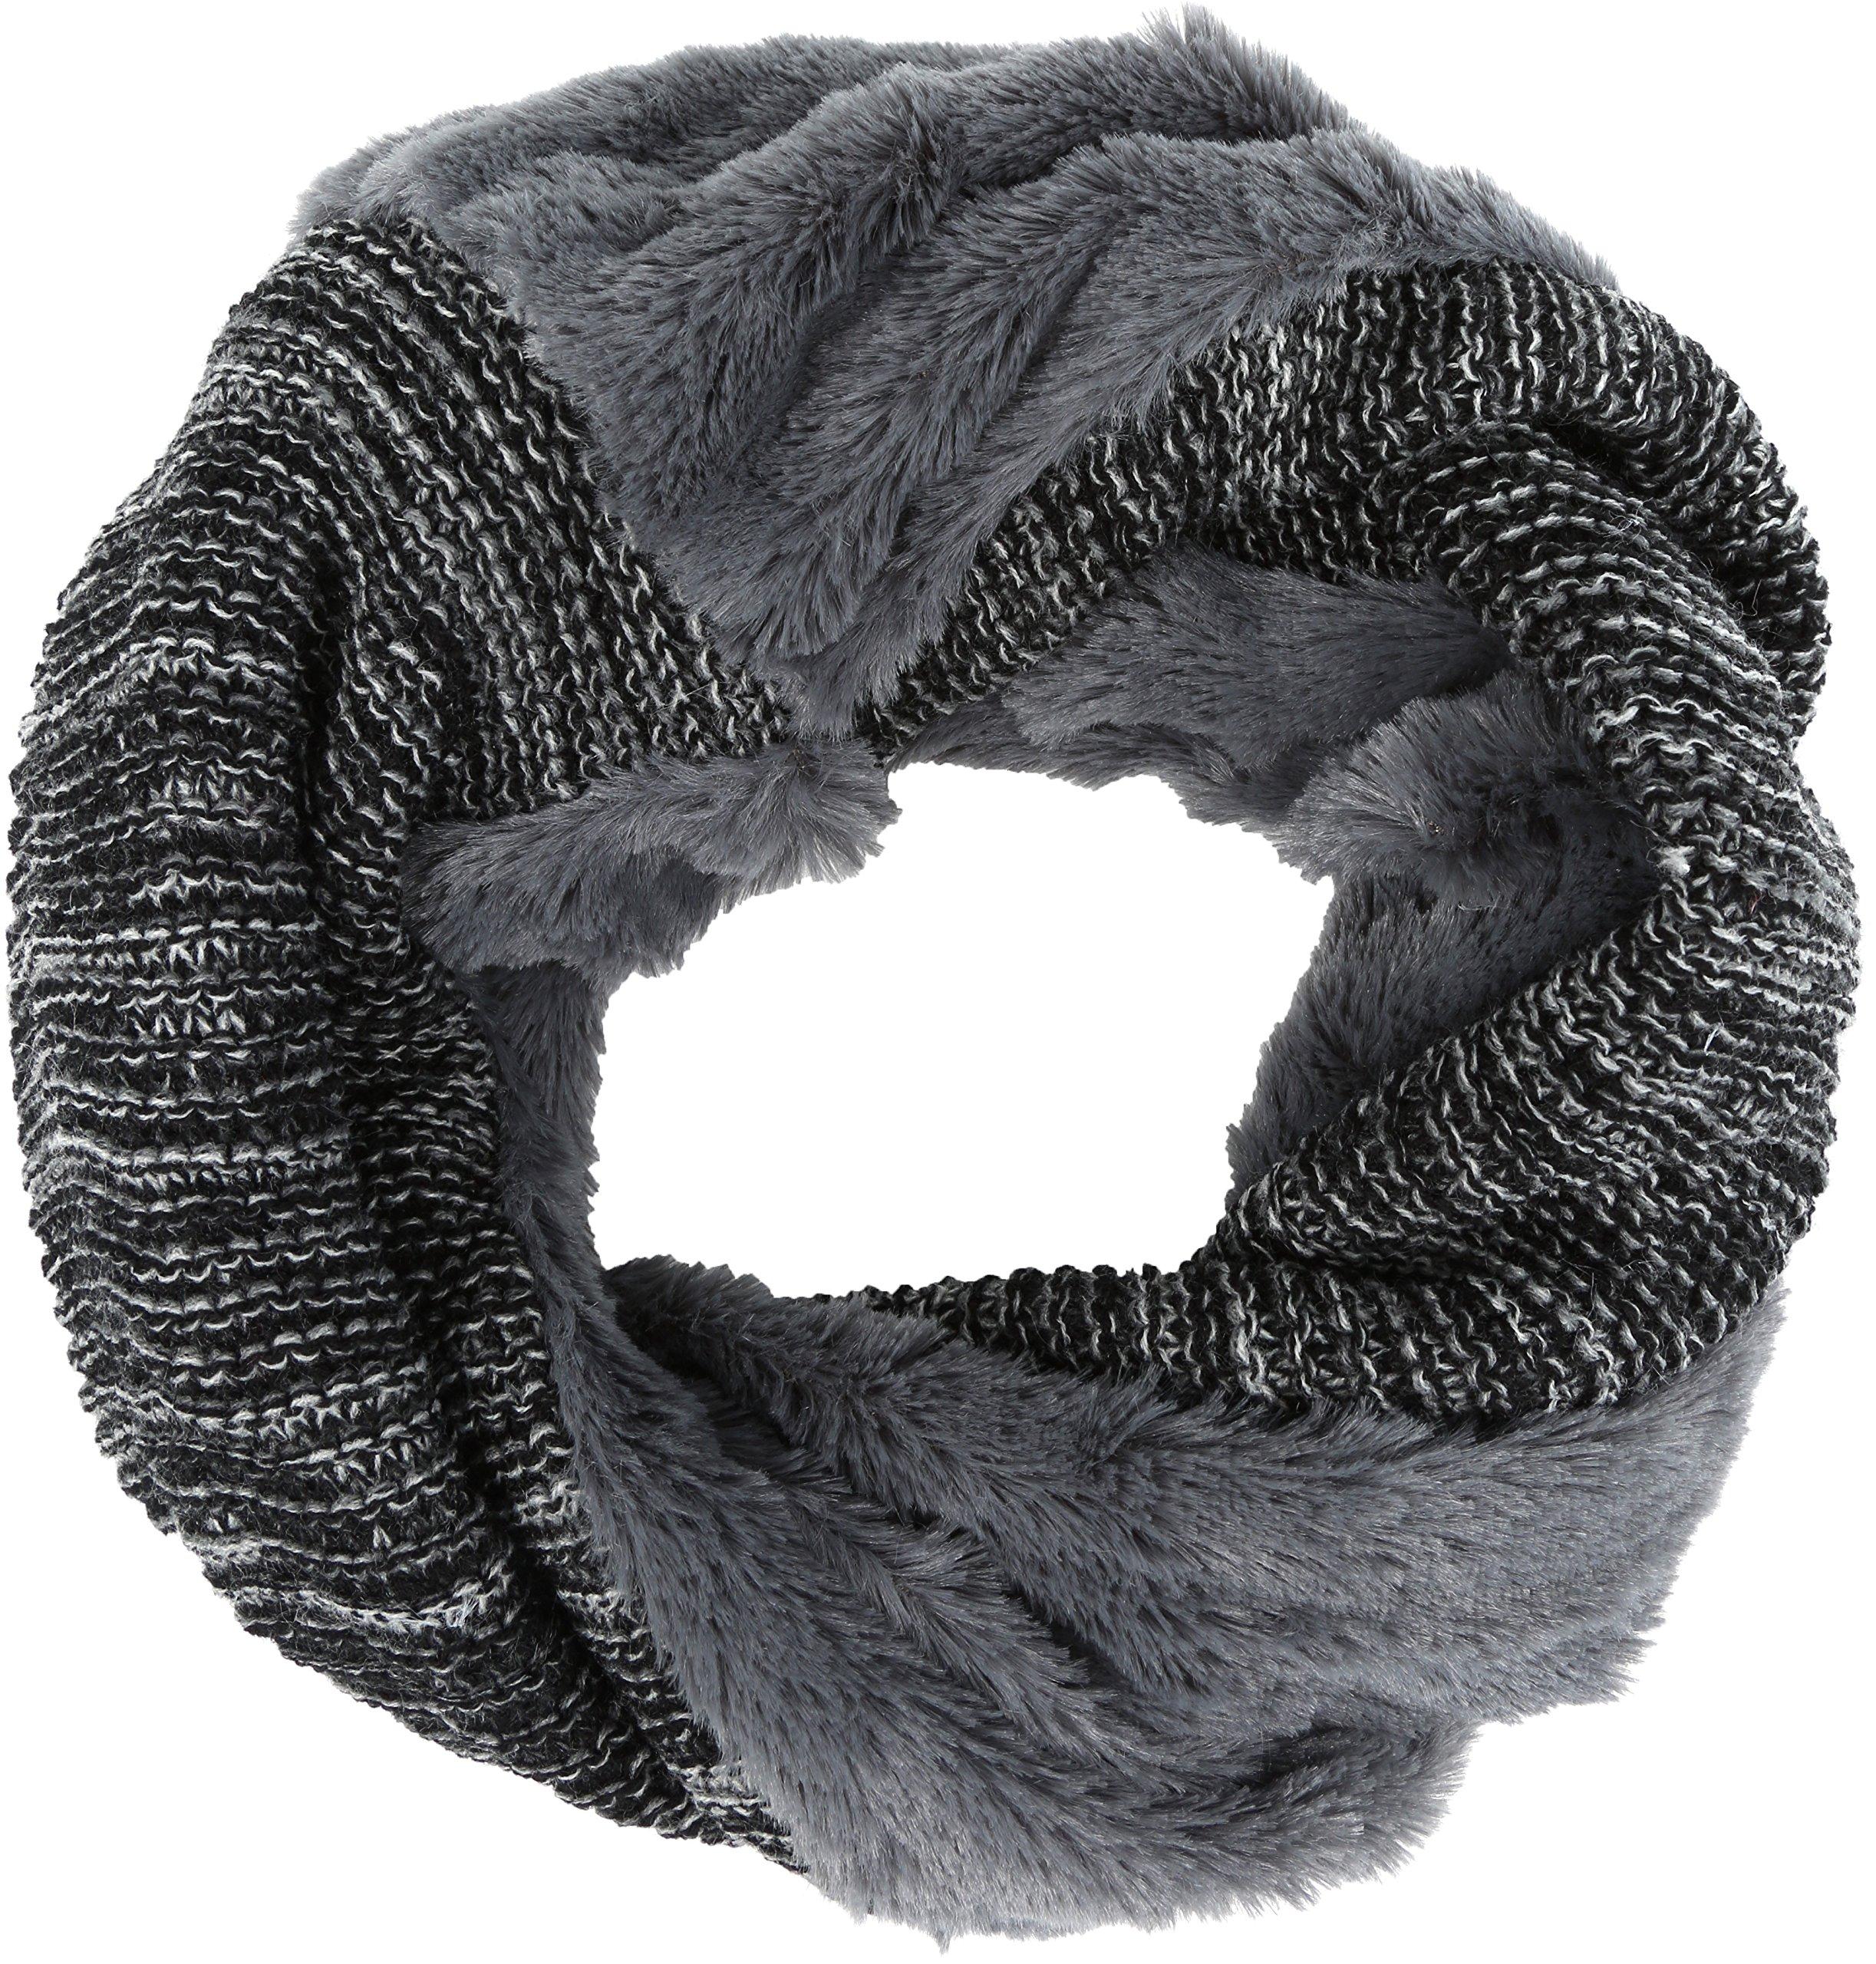 Sakkas 16107 - Sele Short Two Textured Faux Fur Ribbed Knit Mixed Designed Infinity Scarf - Grey - OS by Sakkas (Image #1)